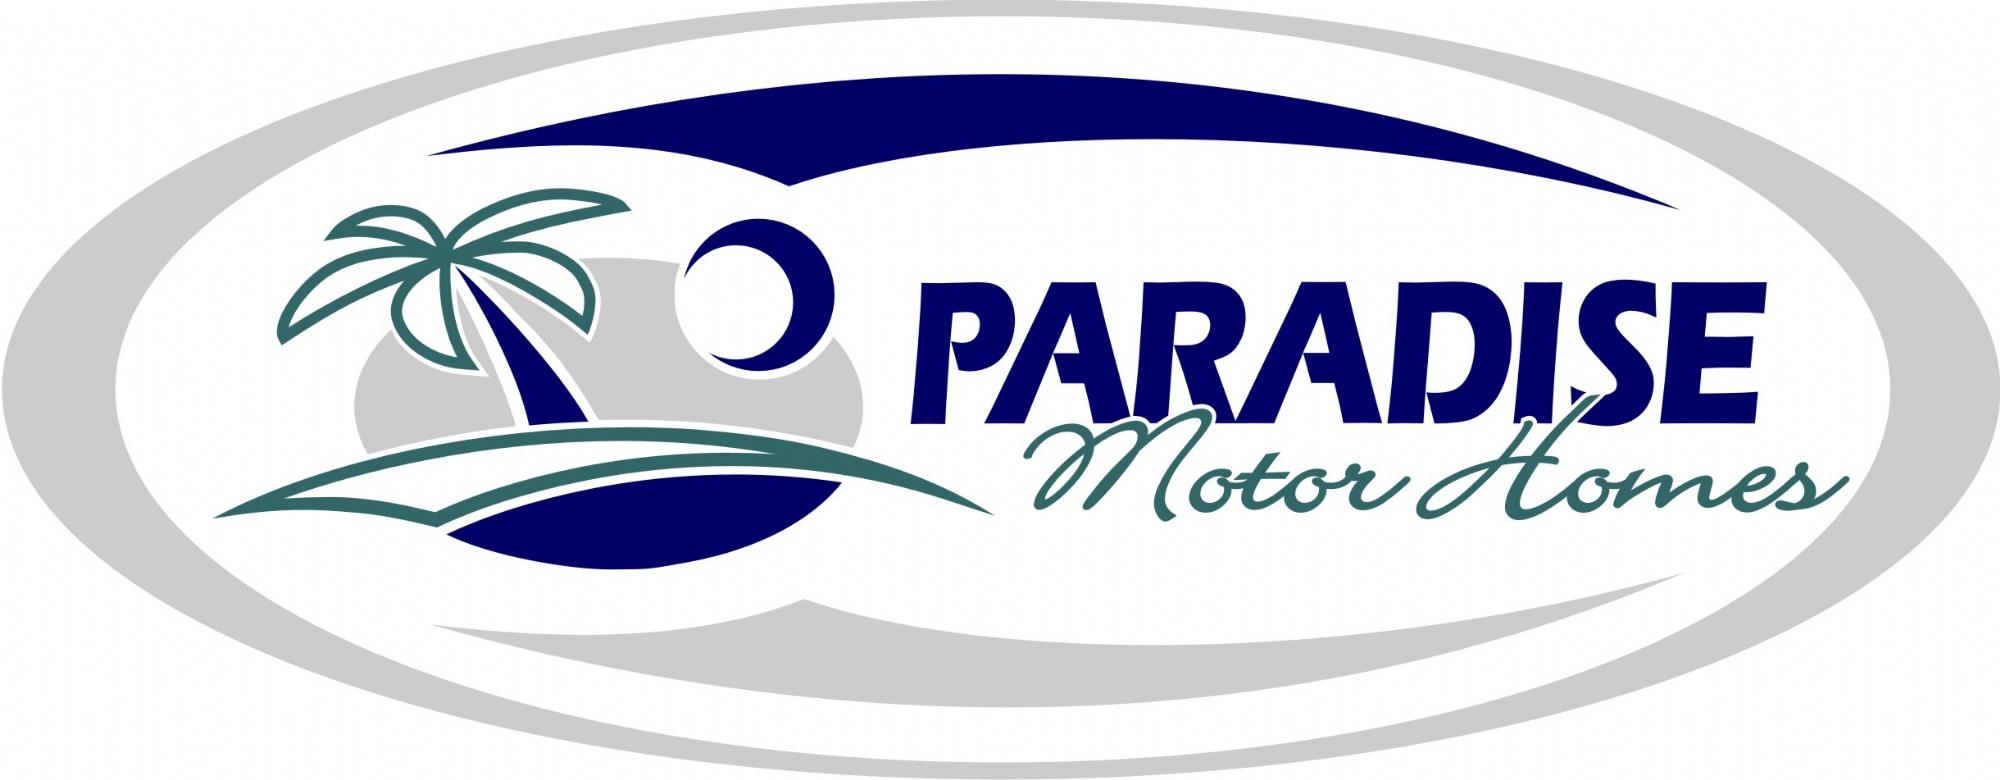 Paradise Motorhomes